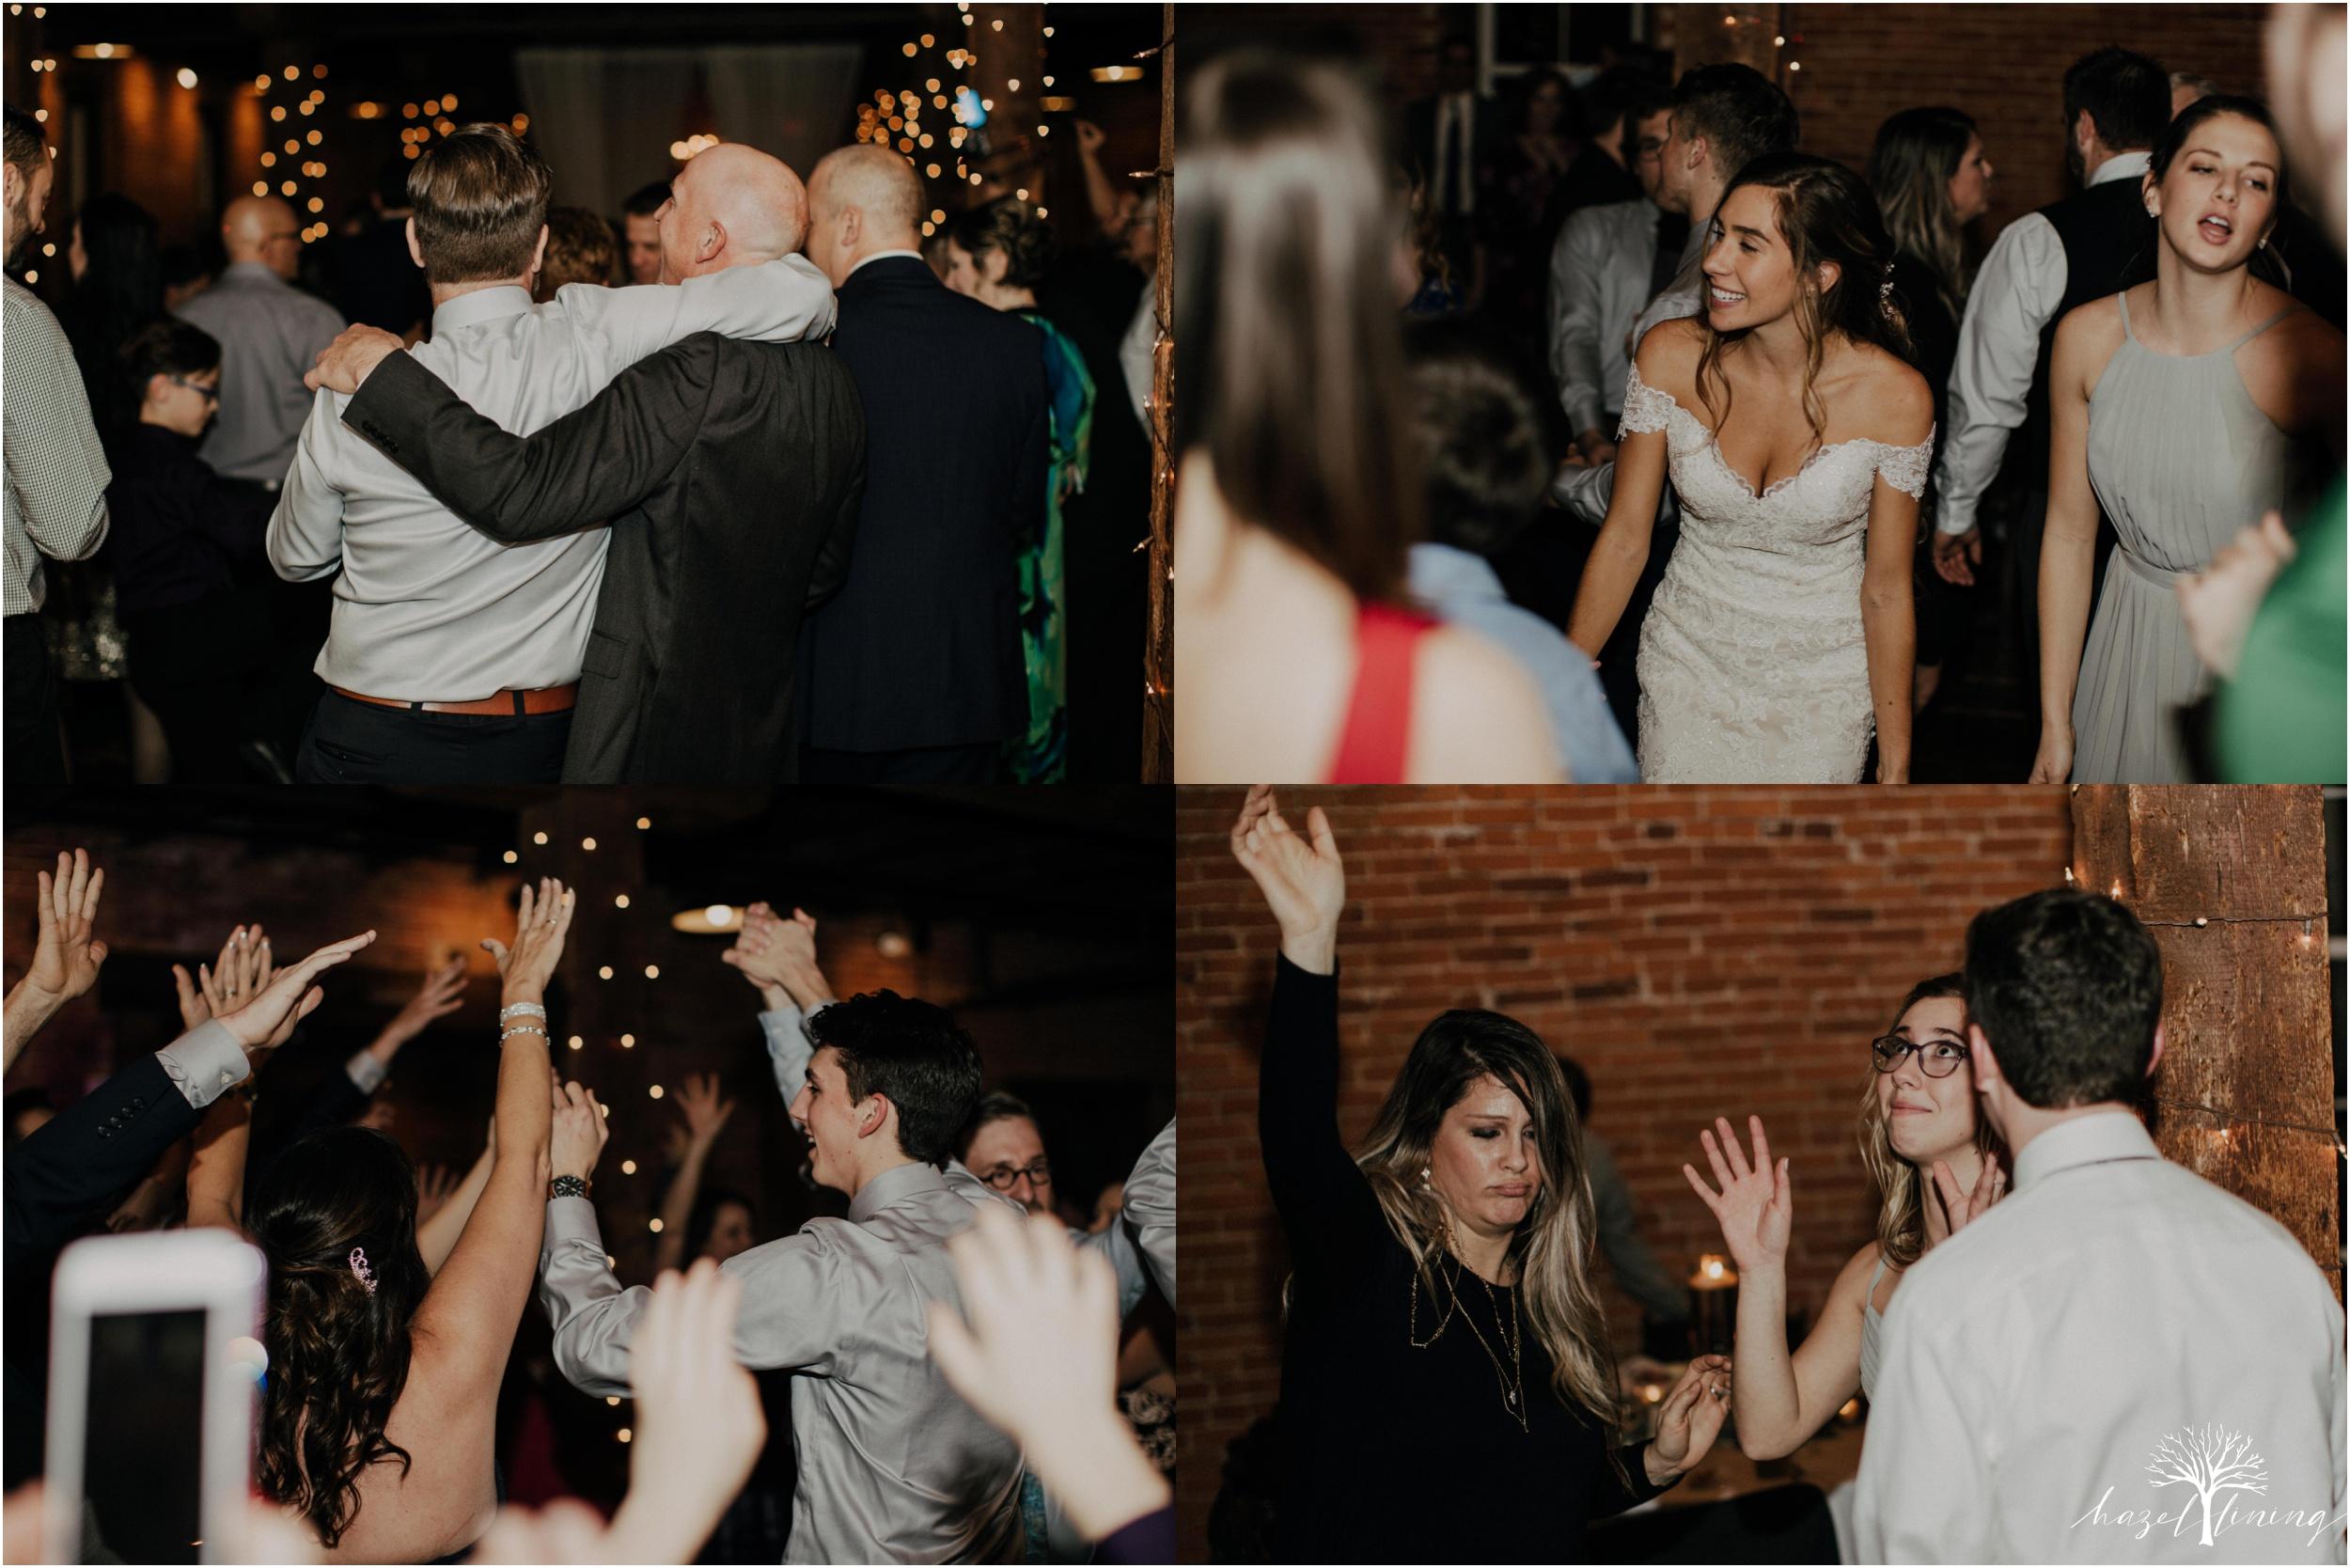 emma-matt-gehringer-the-booking-house-lancaster-manhiem-pennsylvania-winter-wedding_0180.jpg